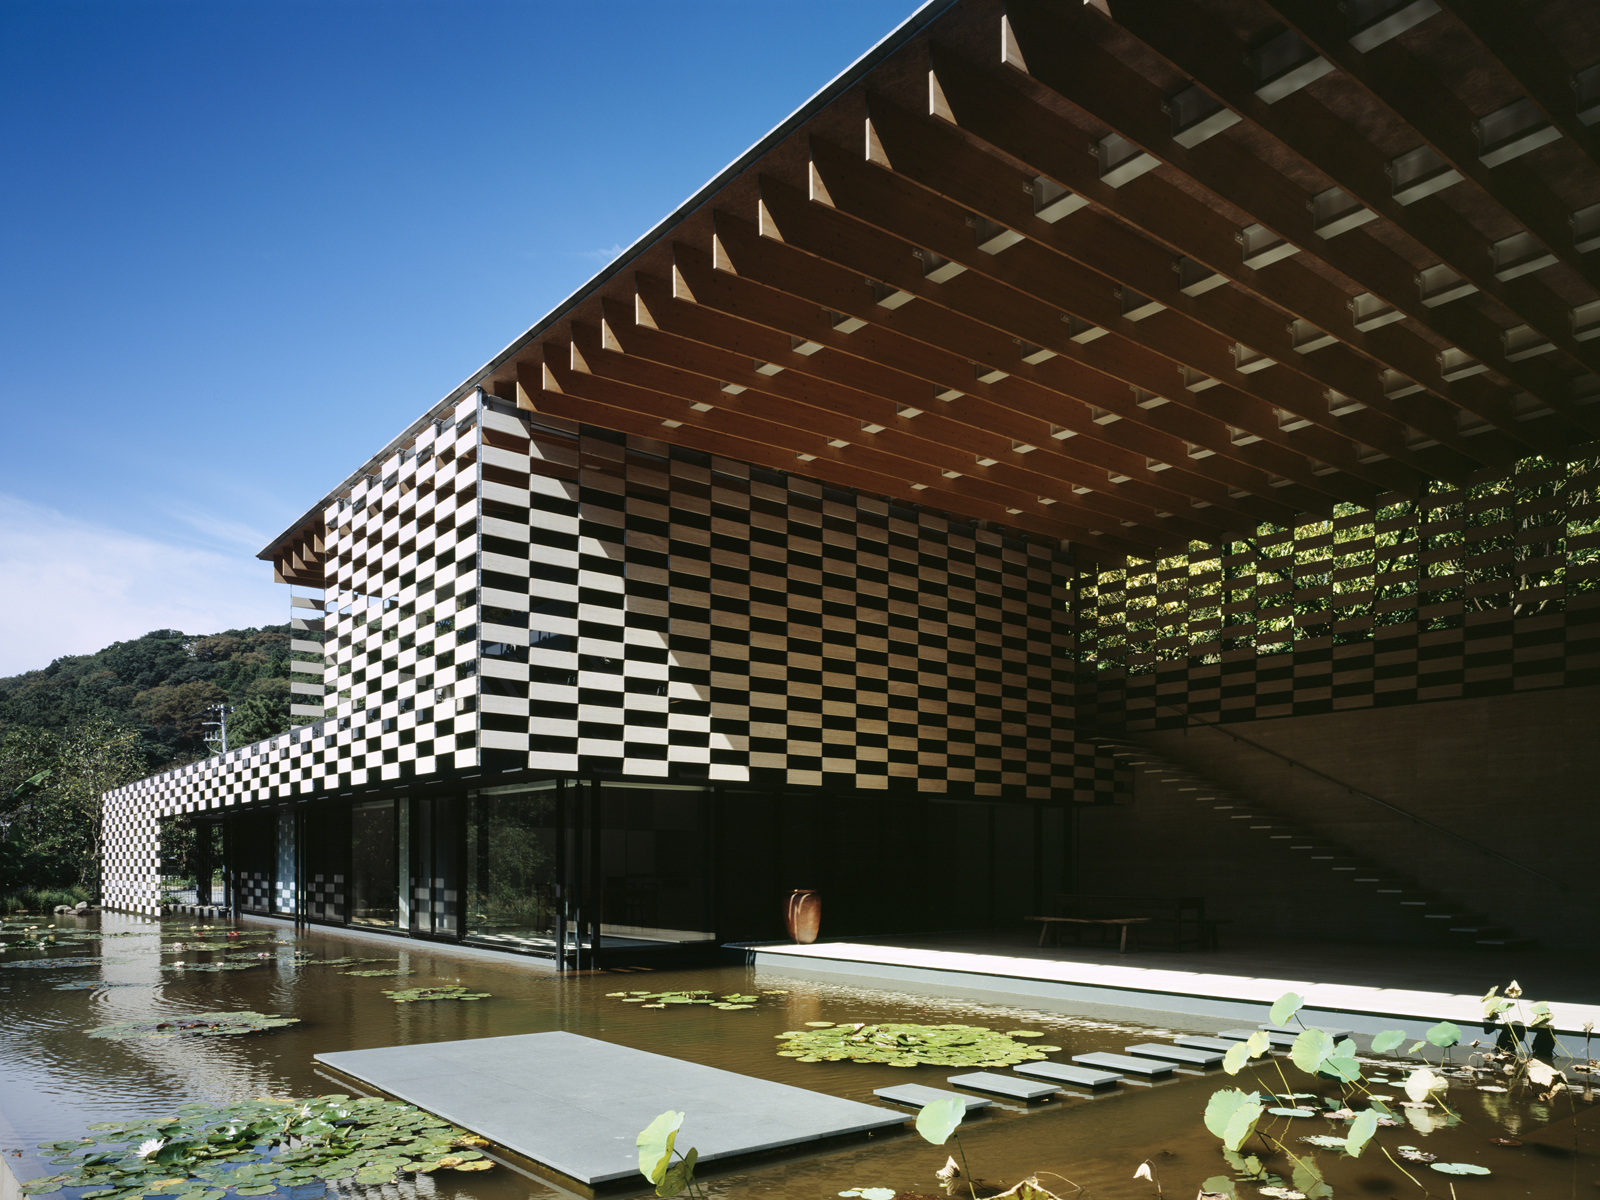 Roof Materials Architecture